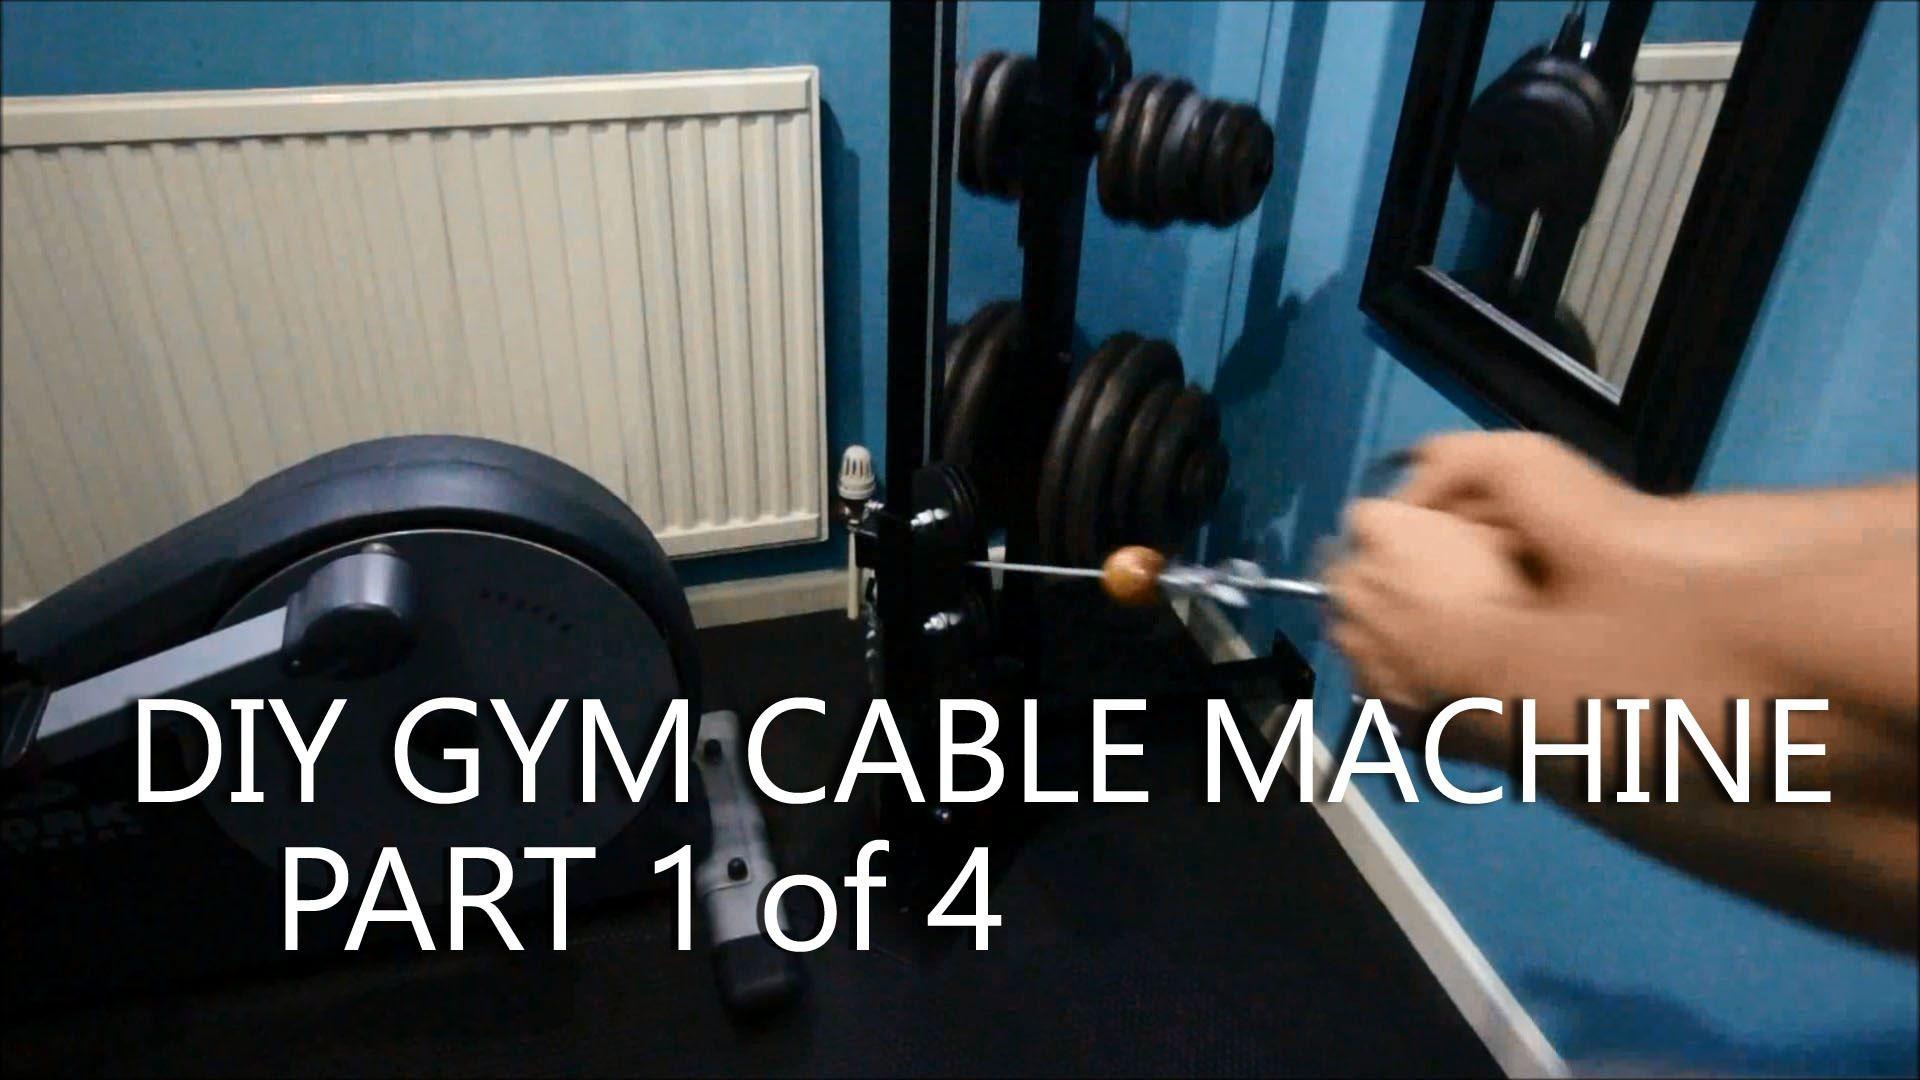 Diy Gym Cable Machine Full Build Log Part 1of4 Diy Gym Diy Home Gym Cable Machine